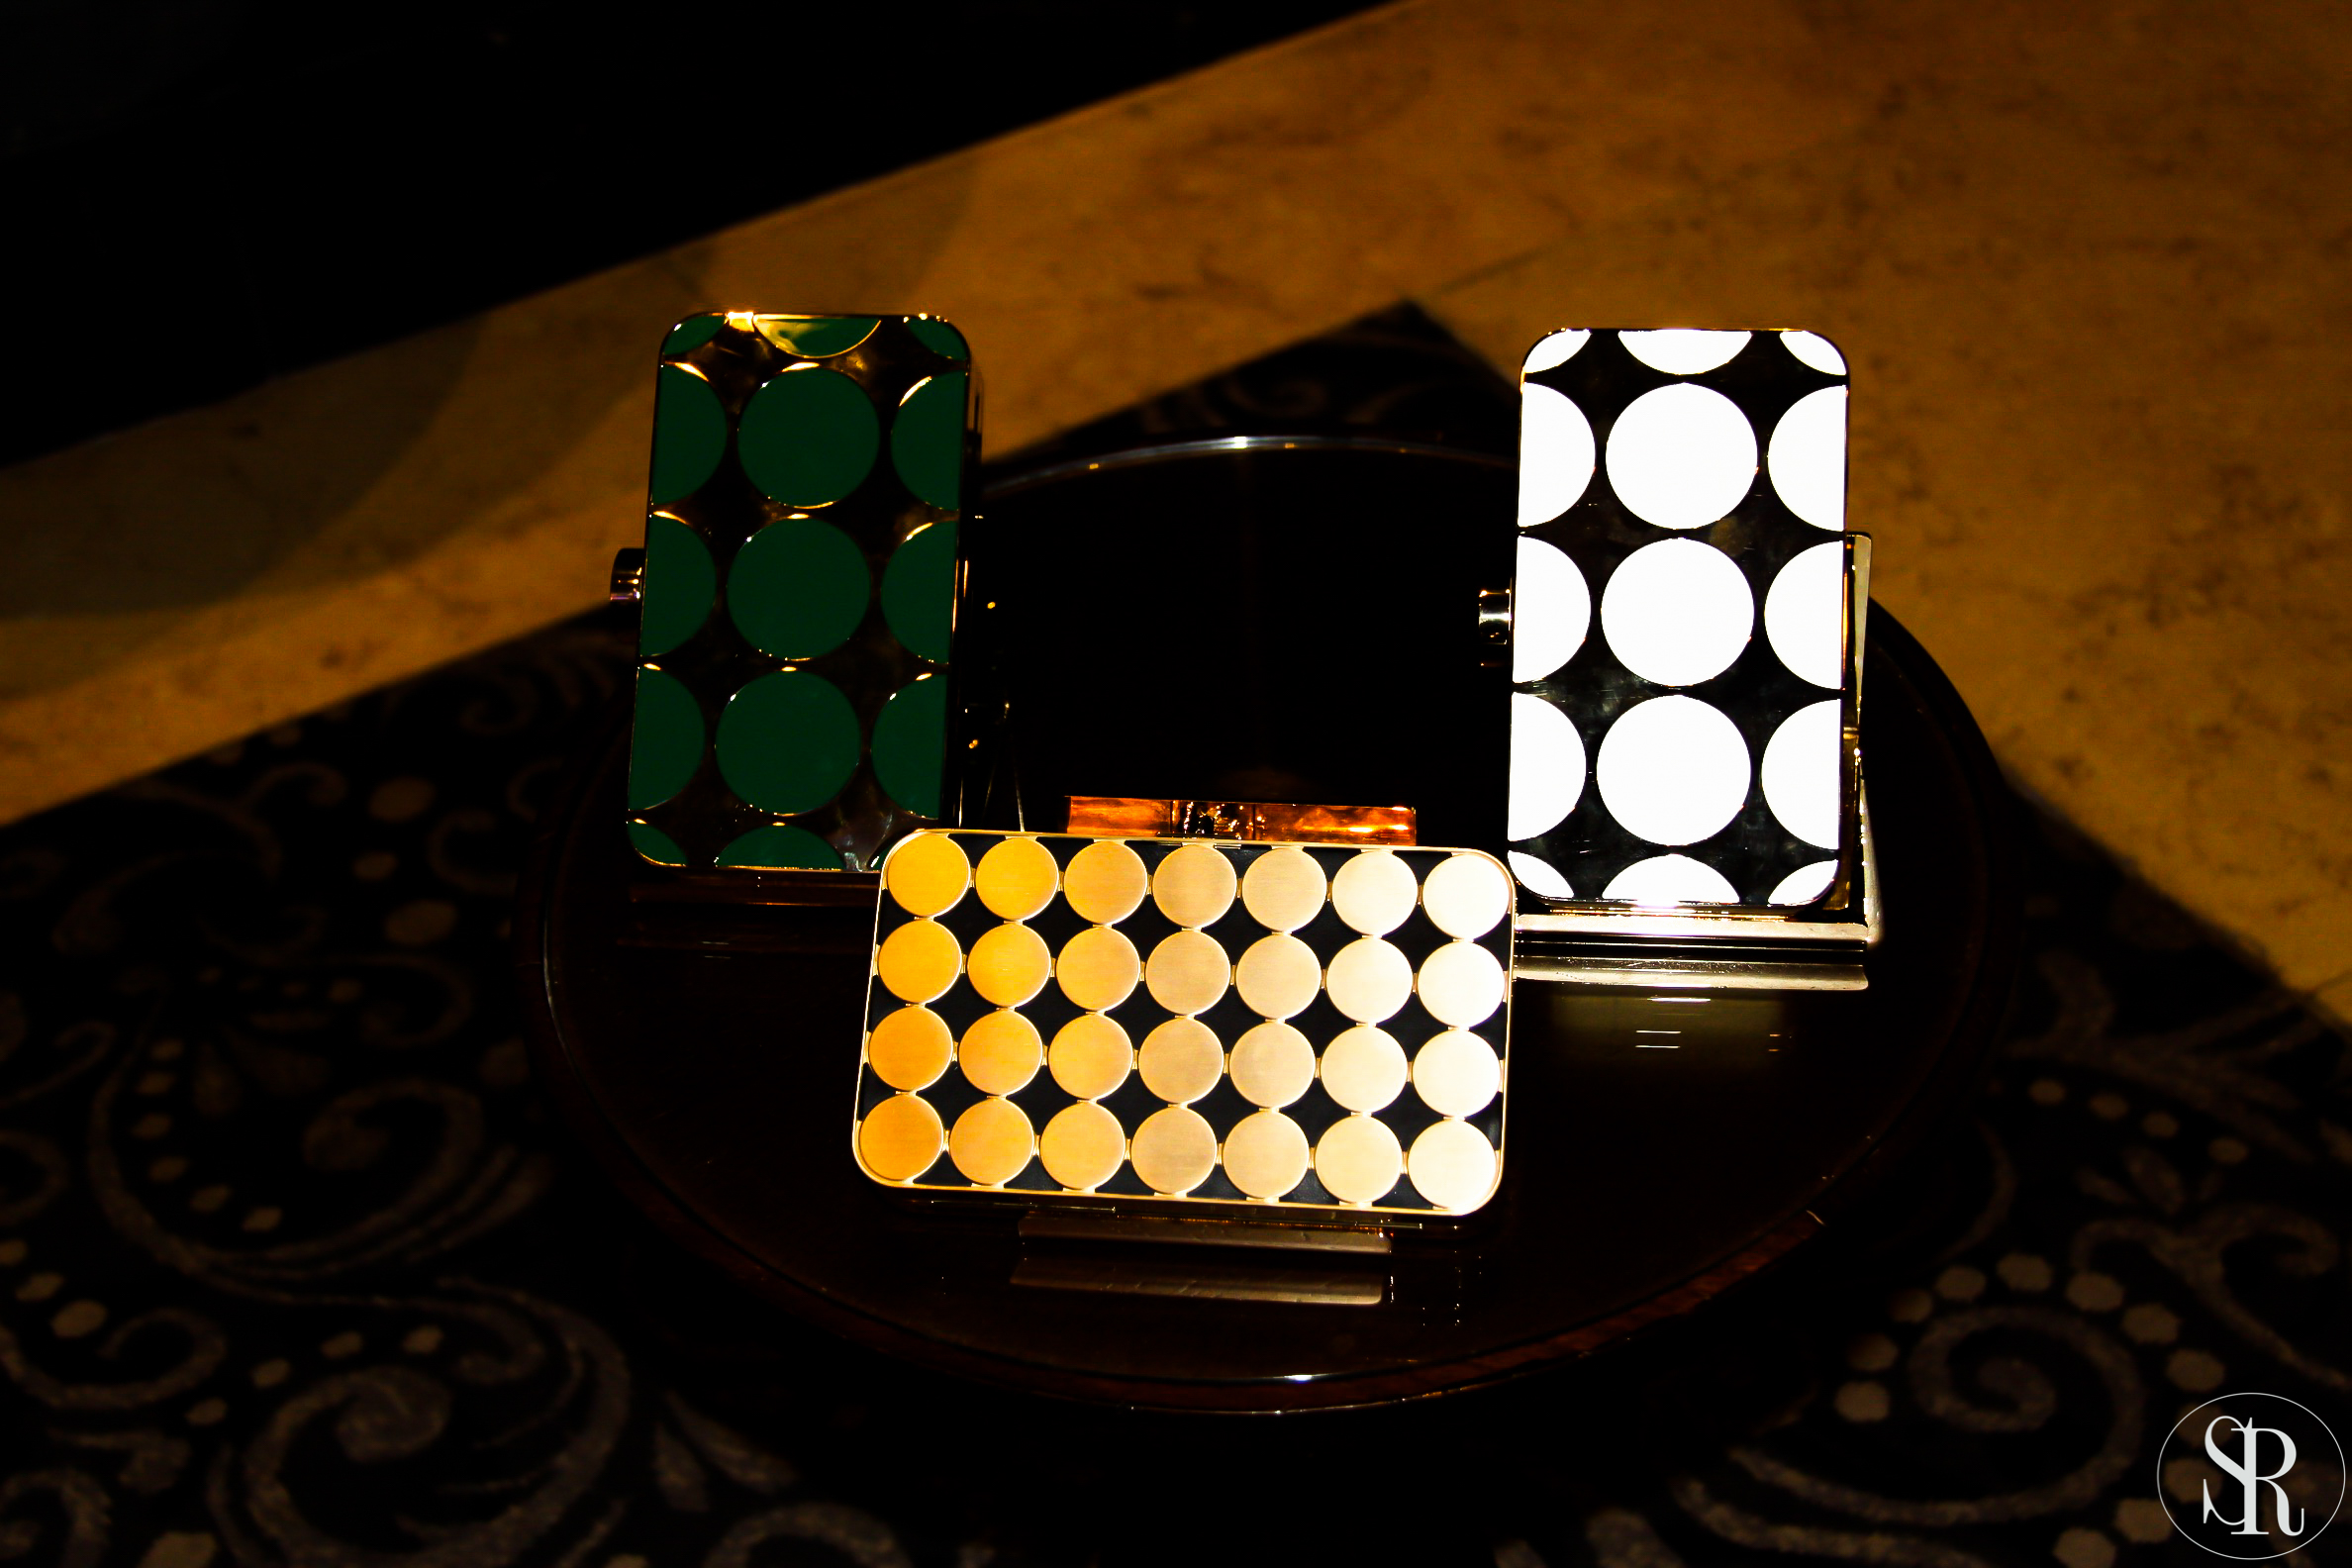 VIP launch of MANOLO BLAHNIK collection Fashion Afternoon Tea by Raffles Dubai-4147.jpg